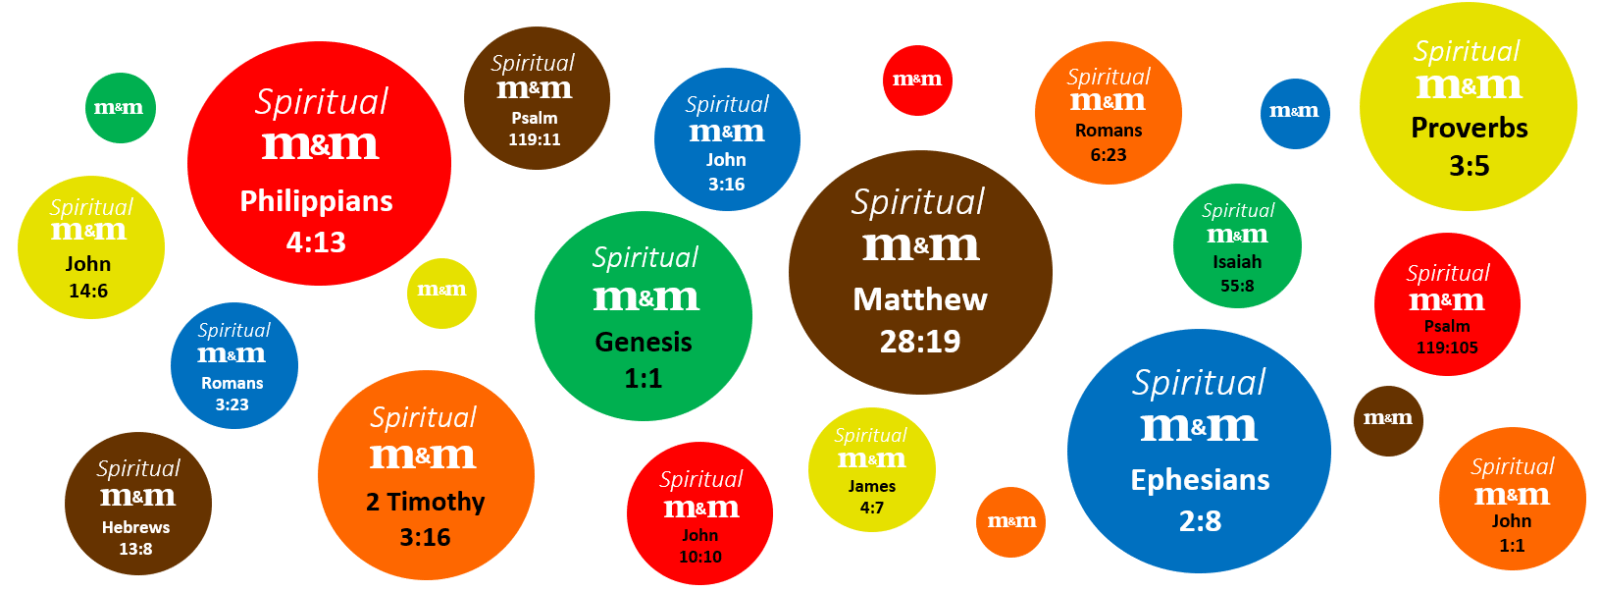 Spiritual M&M cluster image